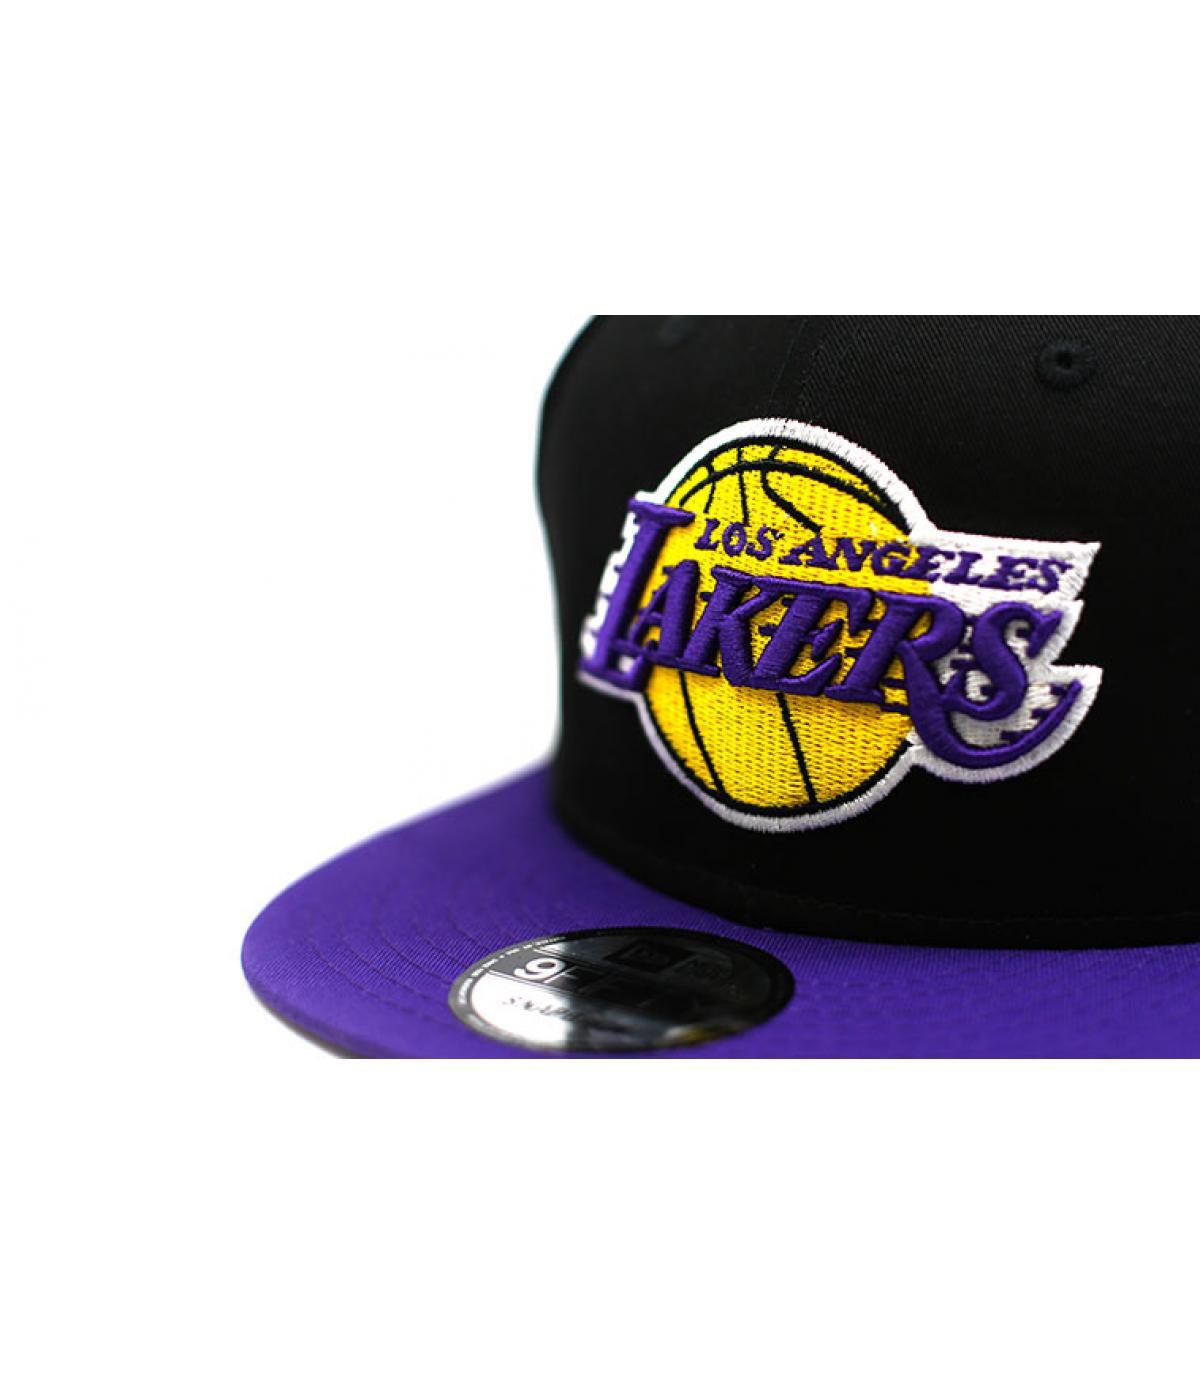 Details Snapback NBA Lakers 950 - Abbildung 3